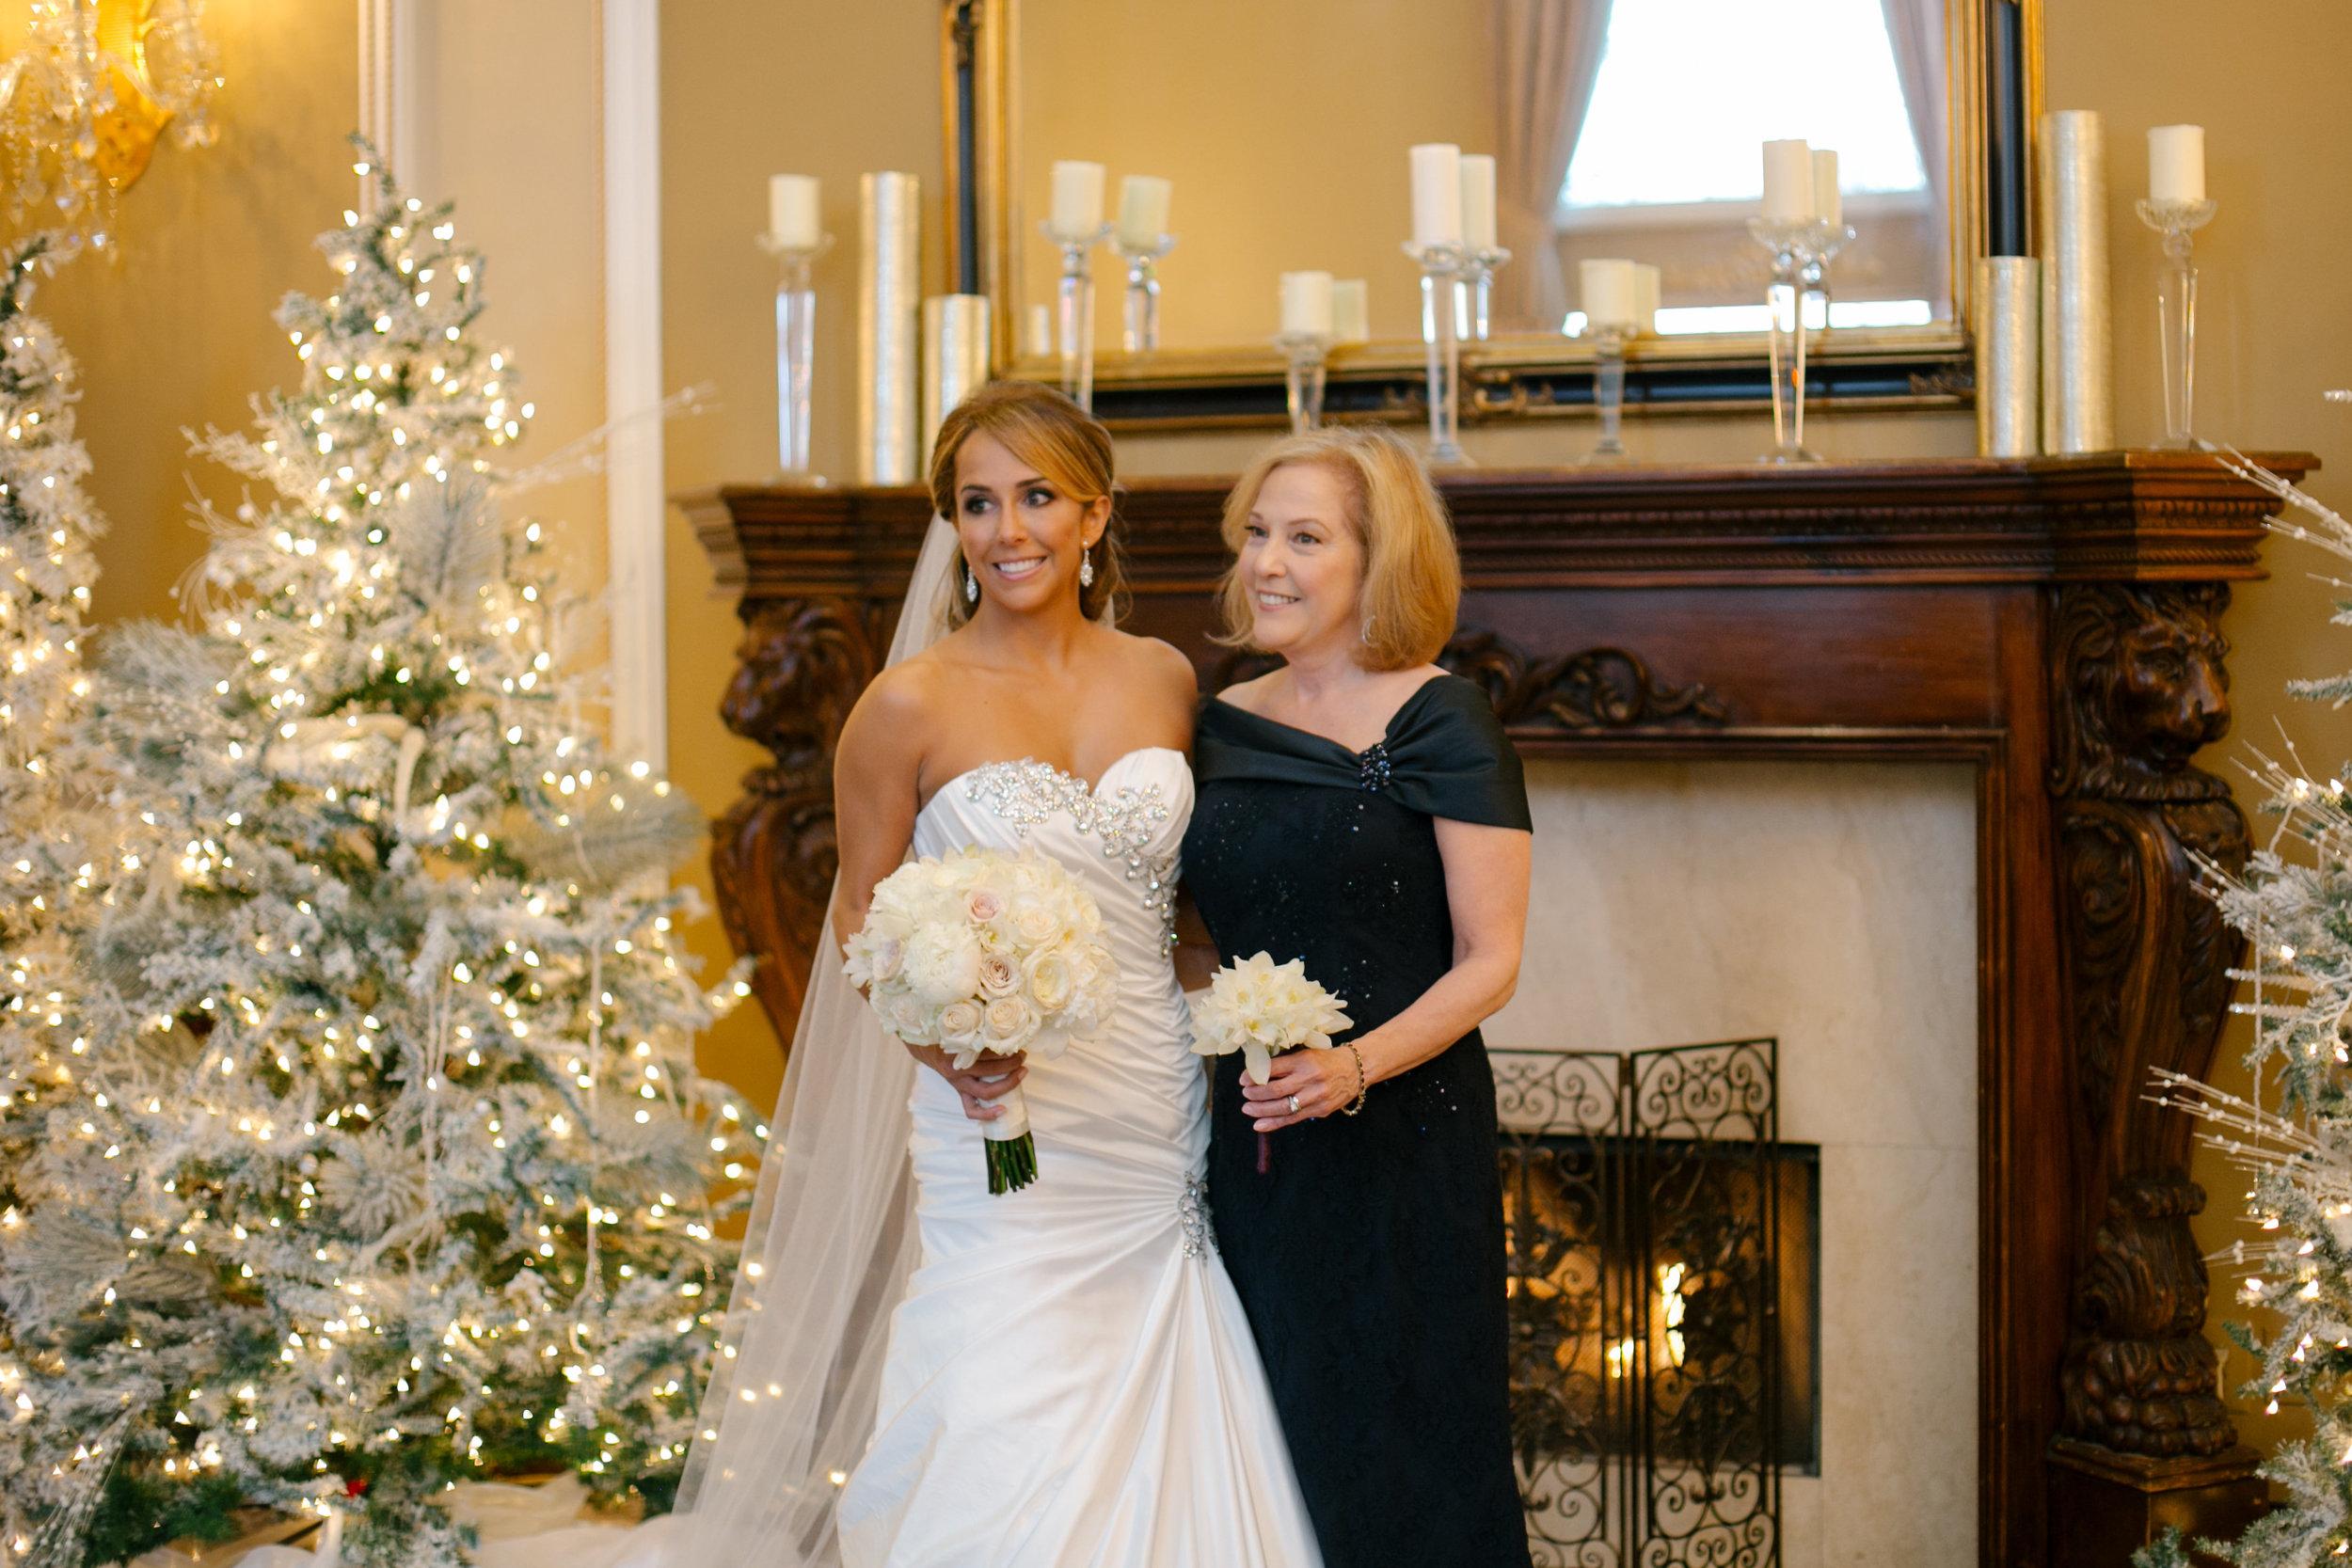 Ceci_New_York_Custom_Invitation_ New_Jersey_Wedding_Luxury_Personalized_Ceci_Style_Bride_Foil_Stamping32.jpg